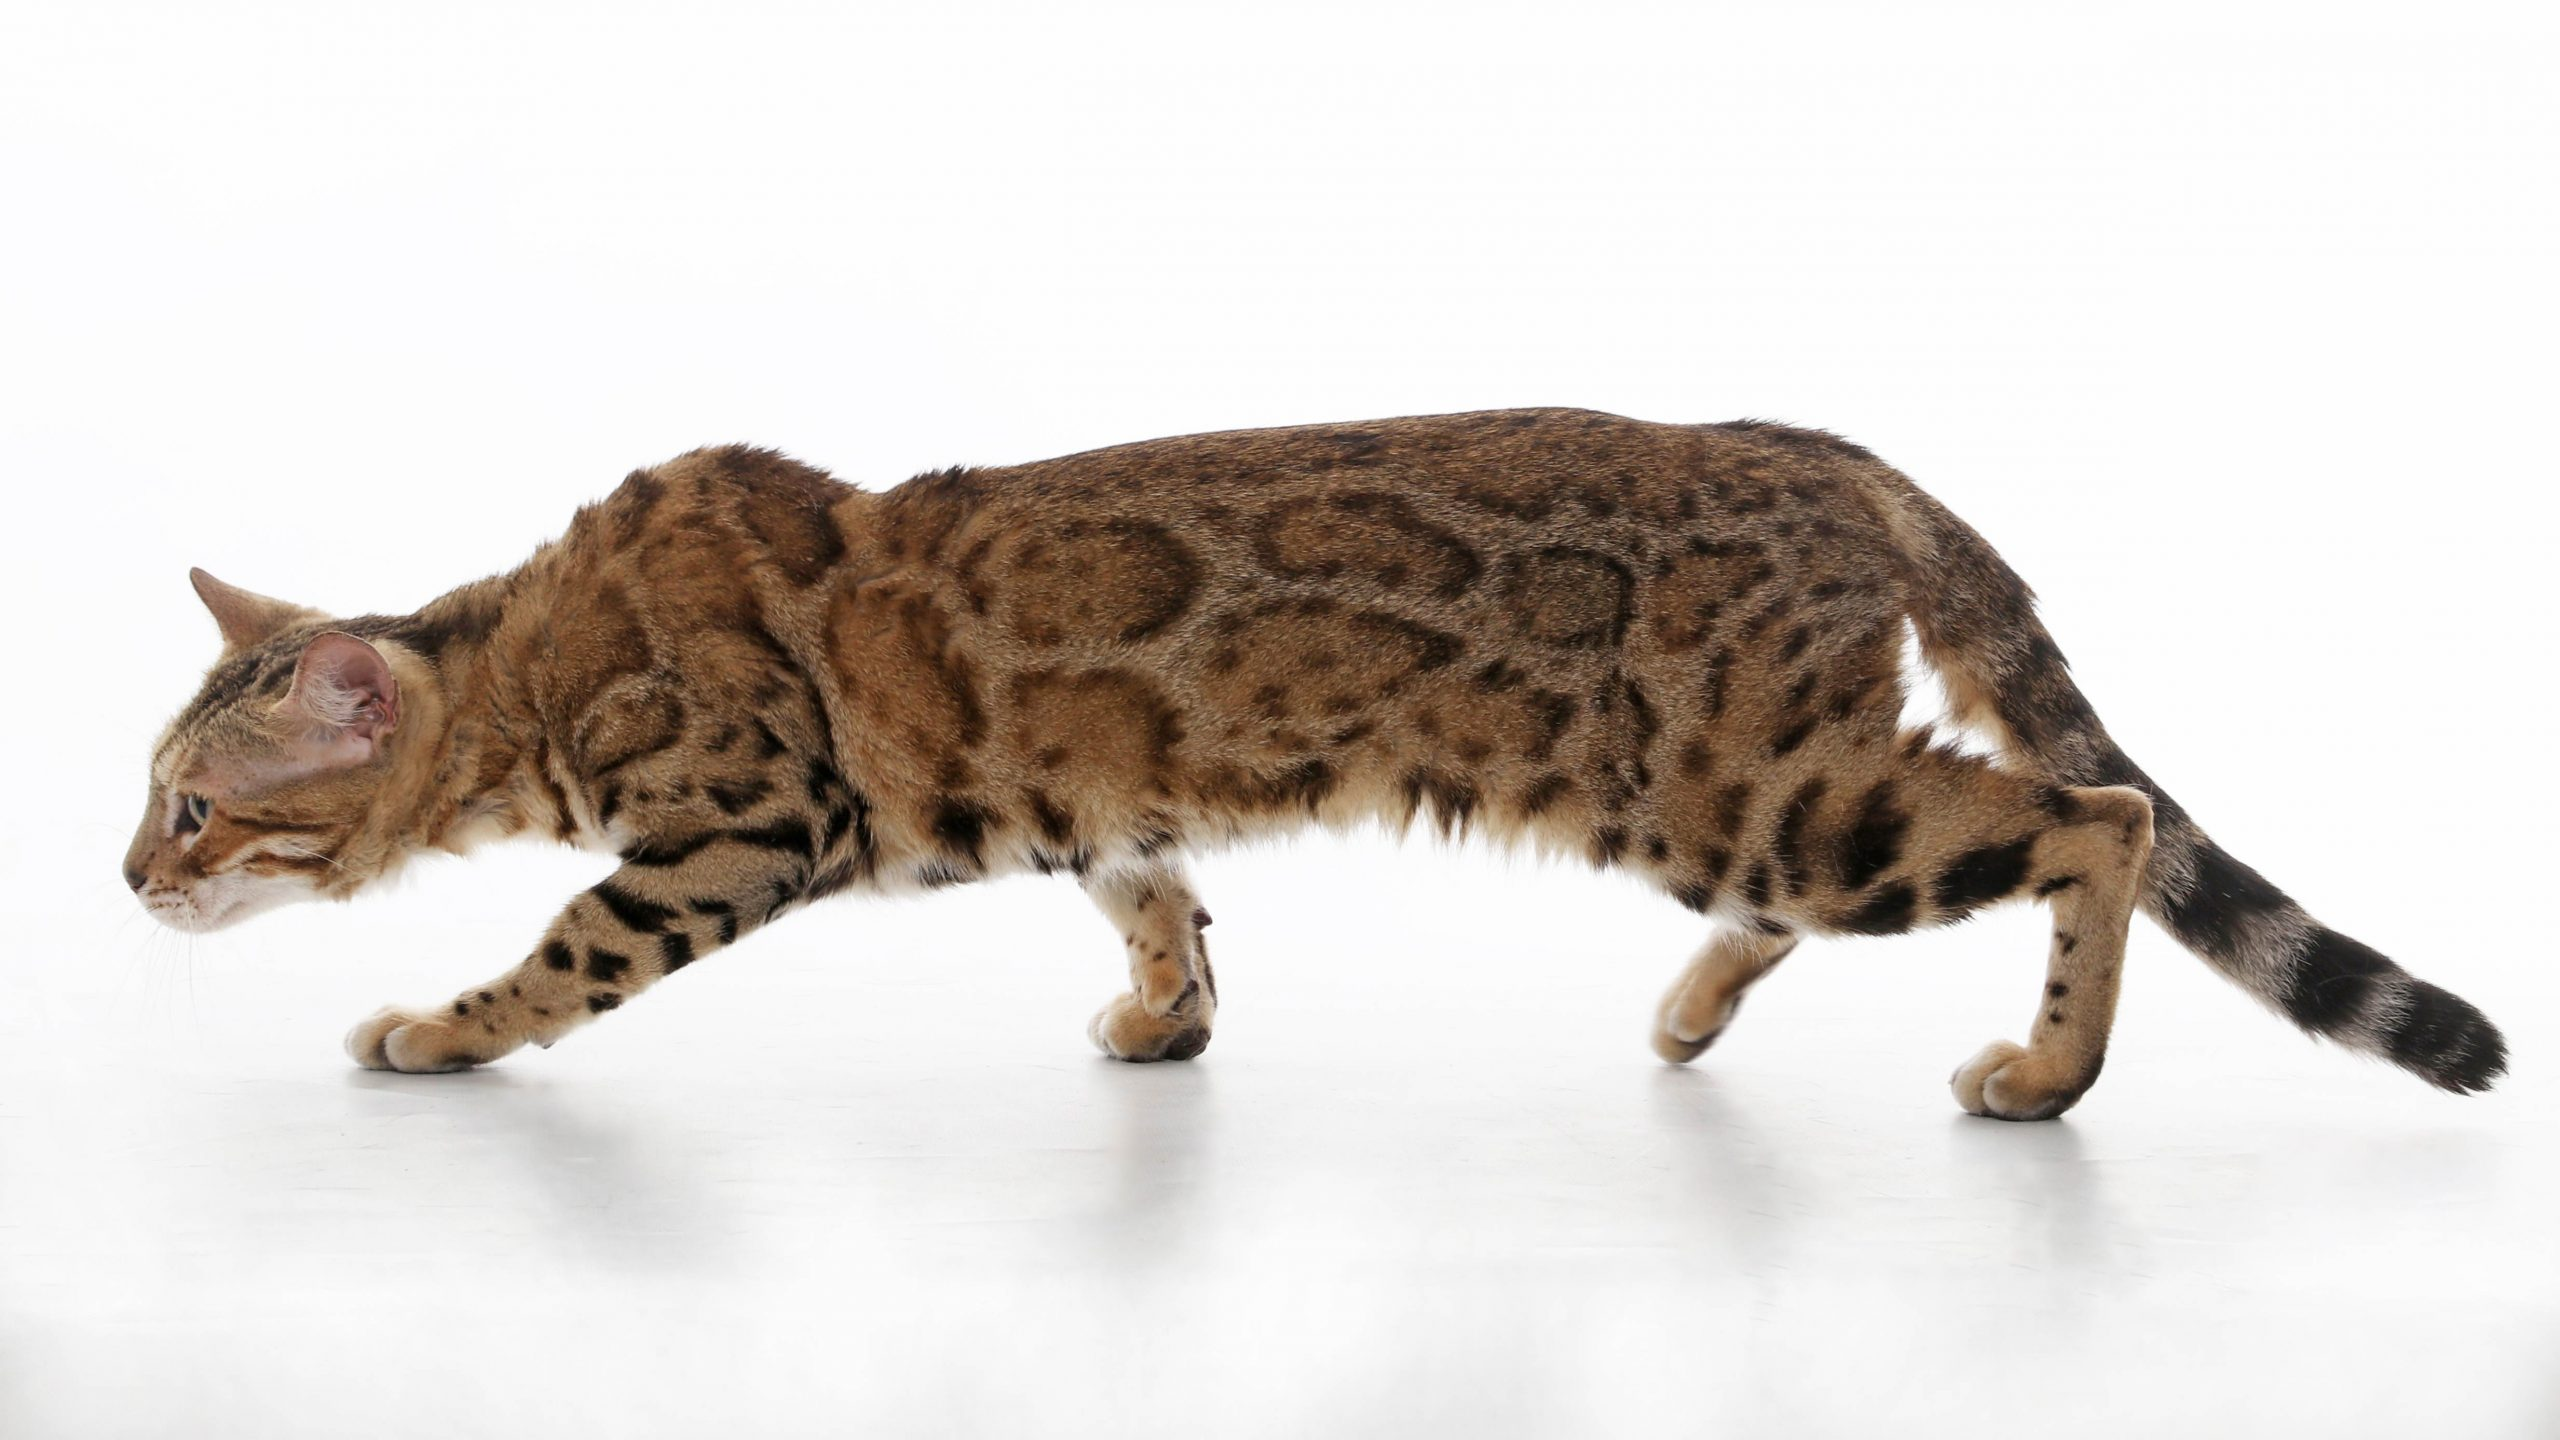 bengal-cat-profile-view-stalking